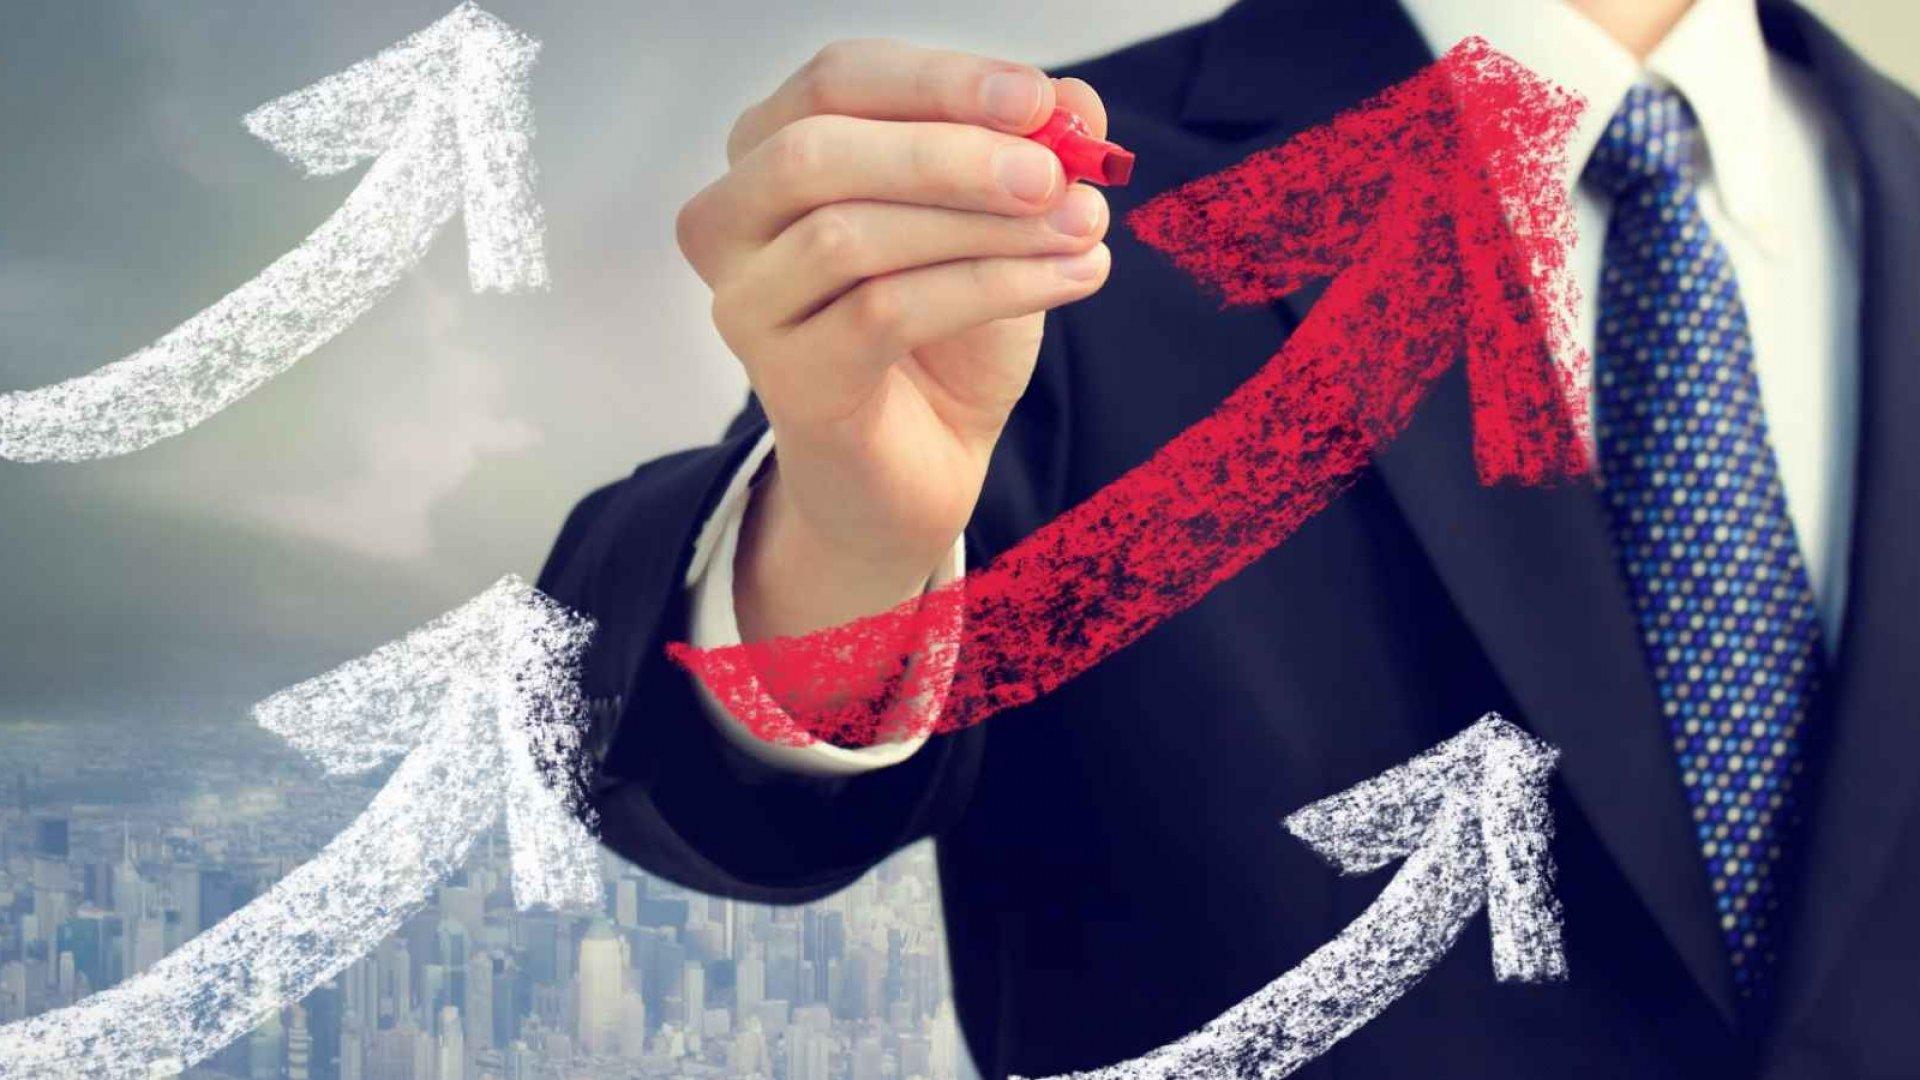 Three Ways to Grow: Build, Partner, Or Buy